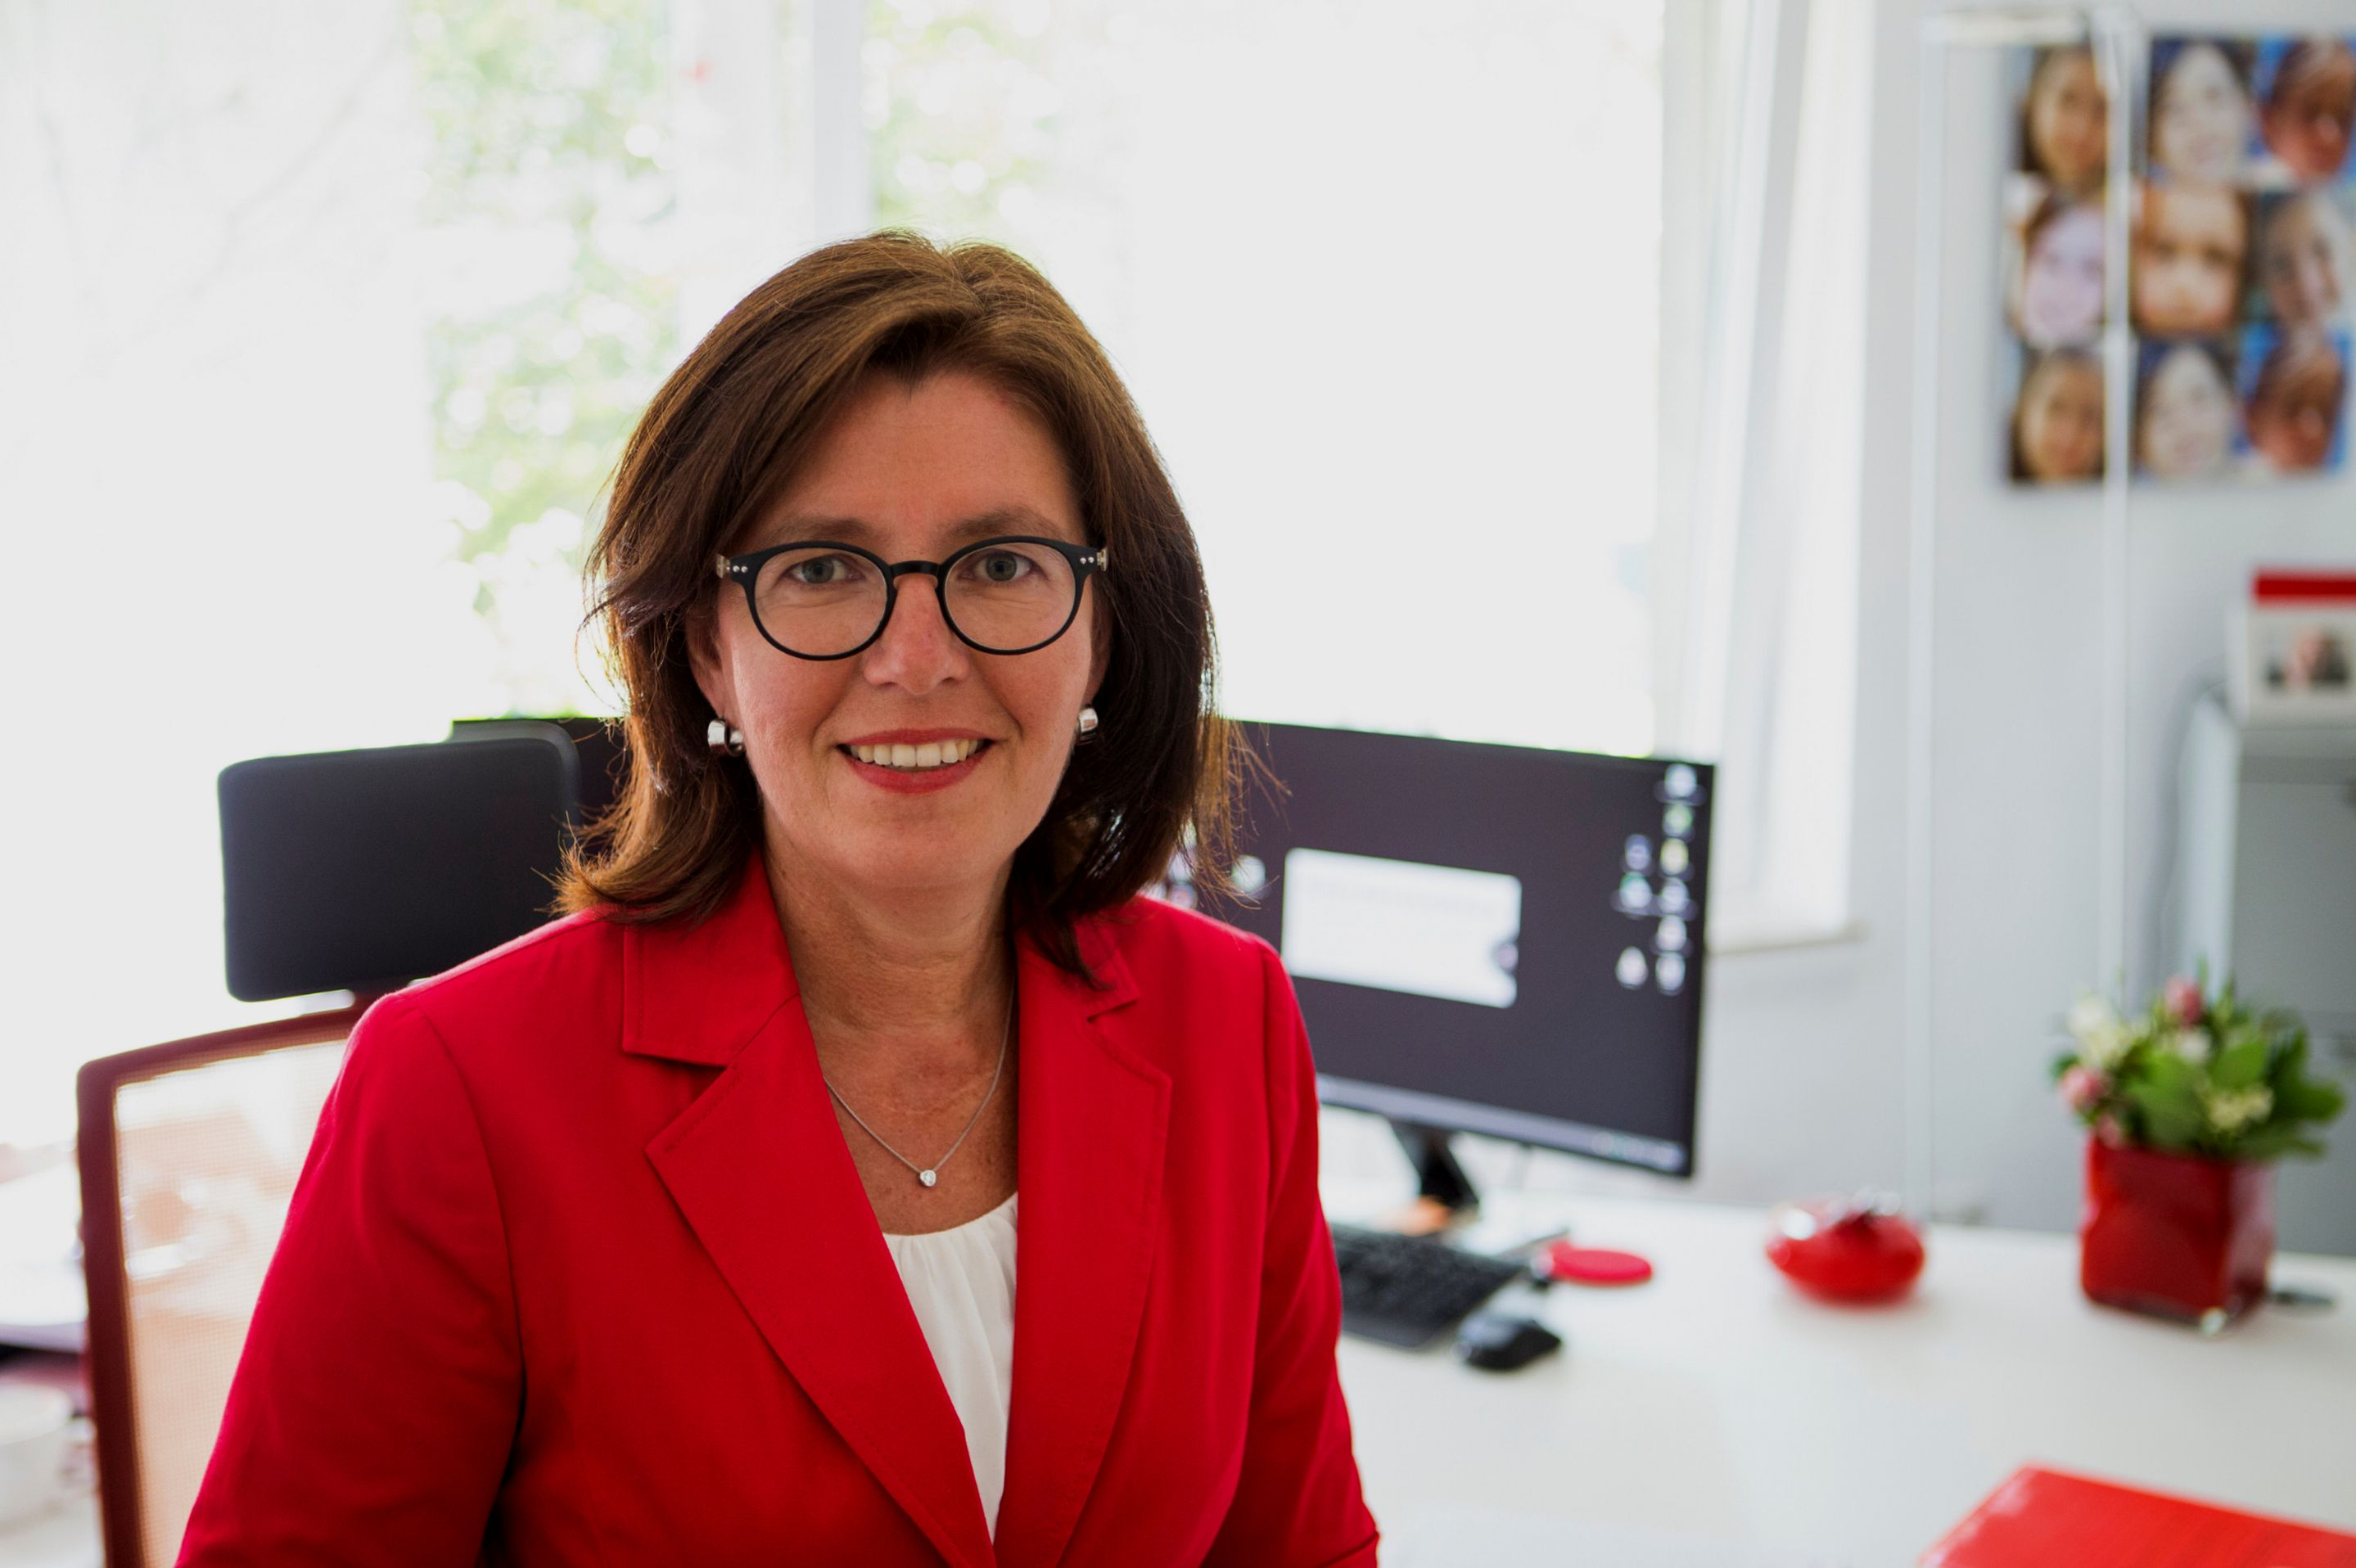 Steuerberatung Andrea Kleinschmidt-Baum